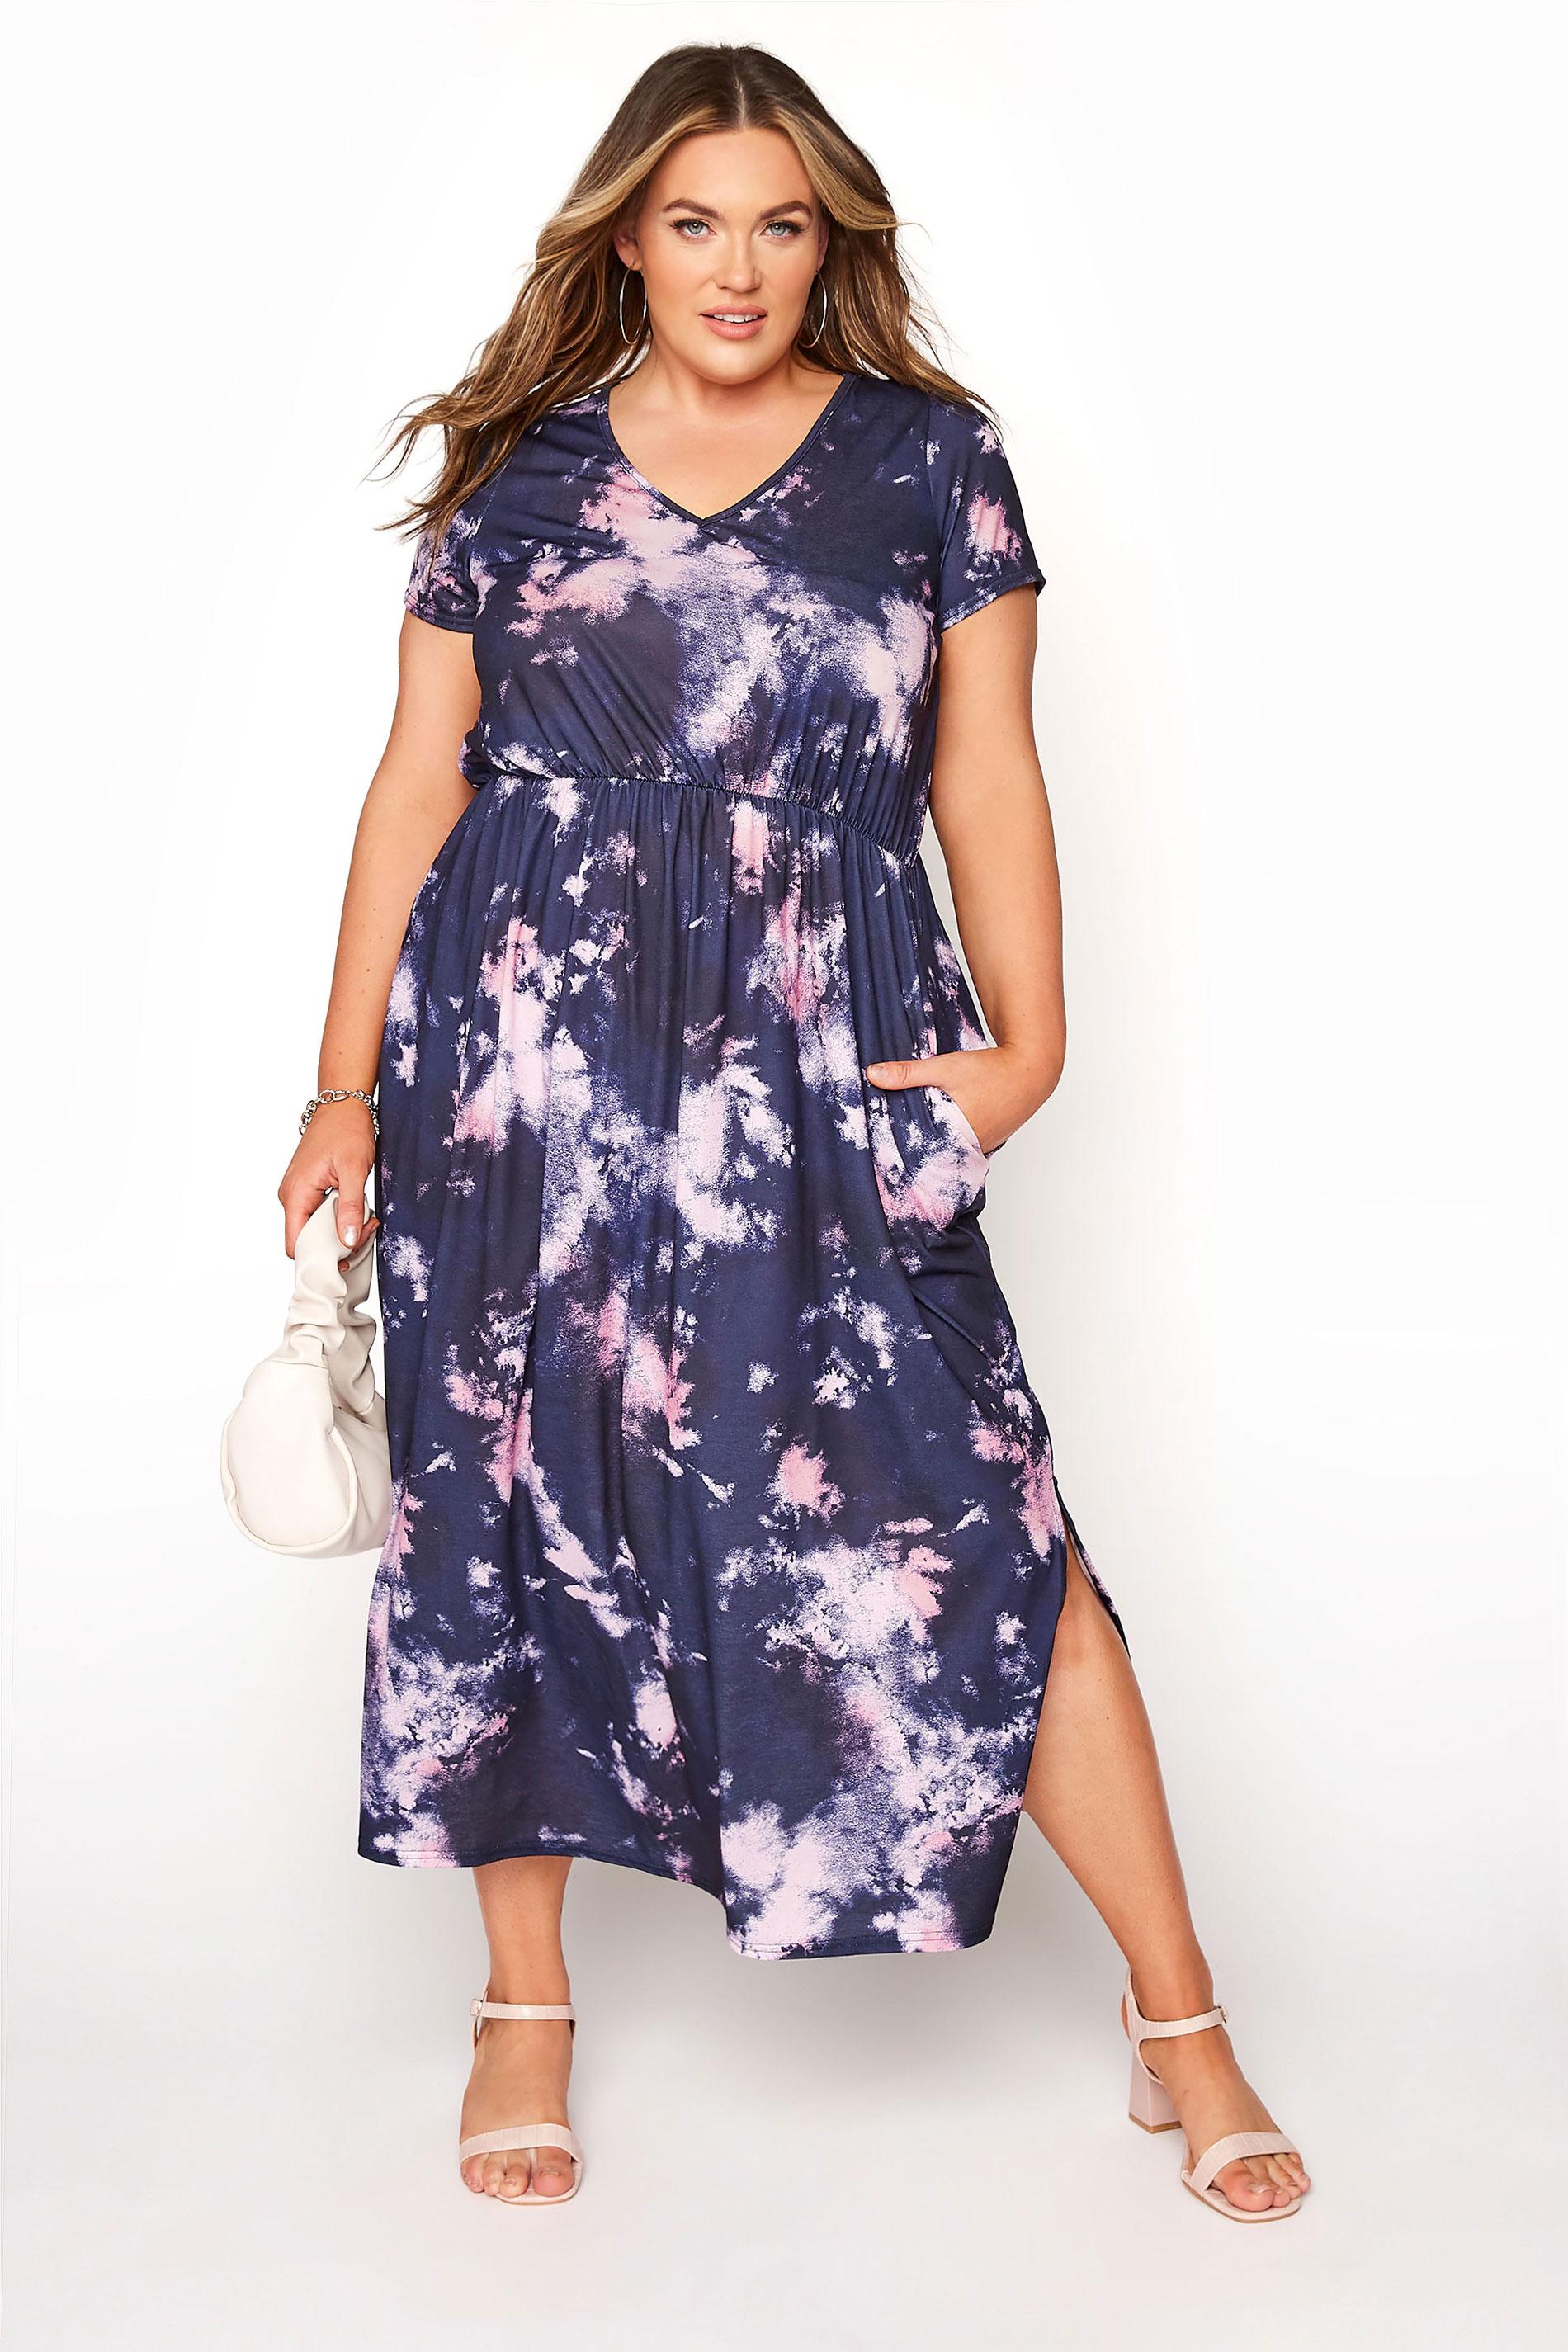 YOURS LONDON Navy Tie Dye Pocket Midi Dress